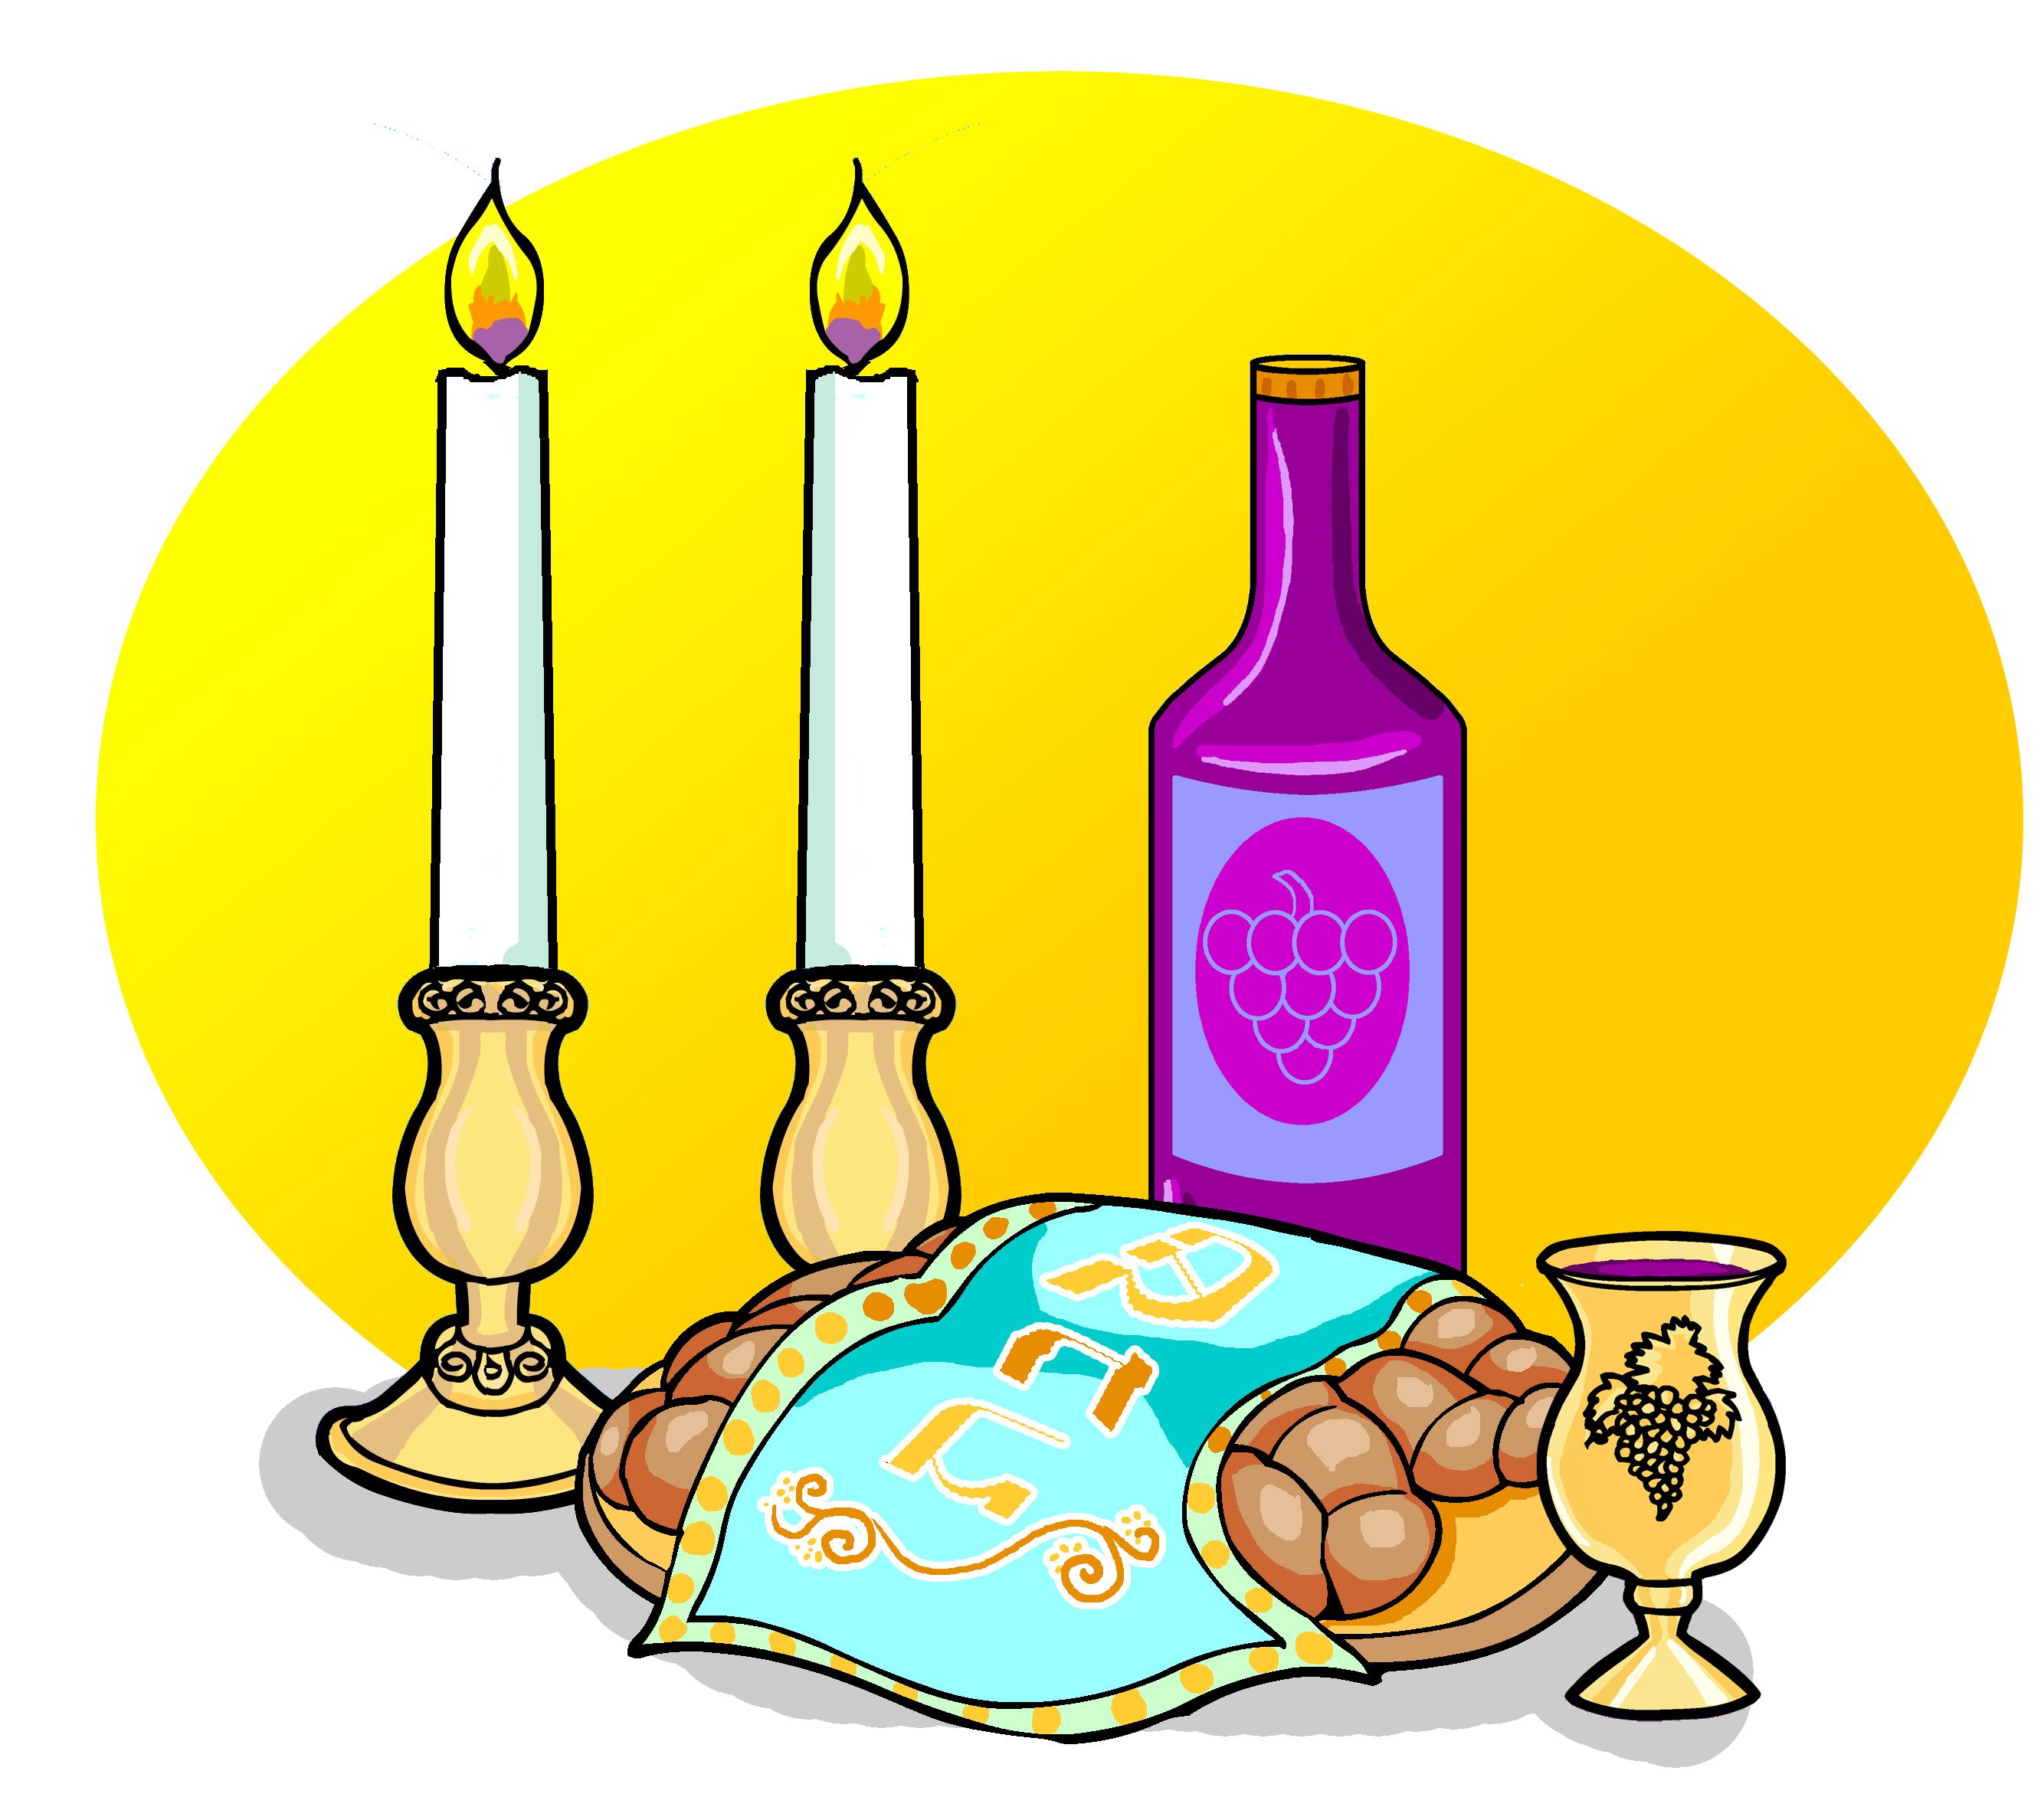 Shabbat Candles Clipart Shabbat Items Wi-Shabbat Candles Clipart Shabbat Items With Background-5